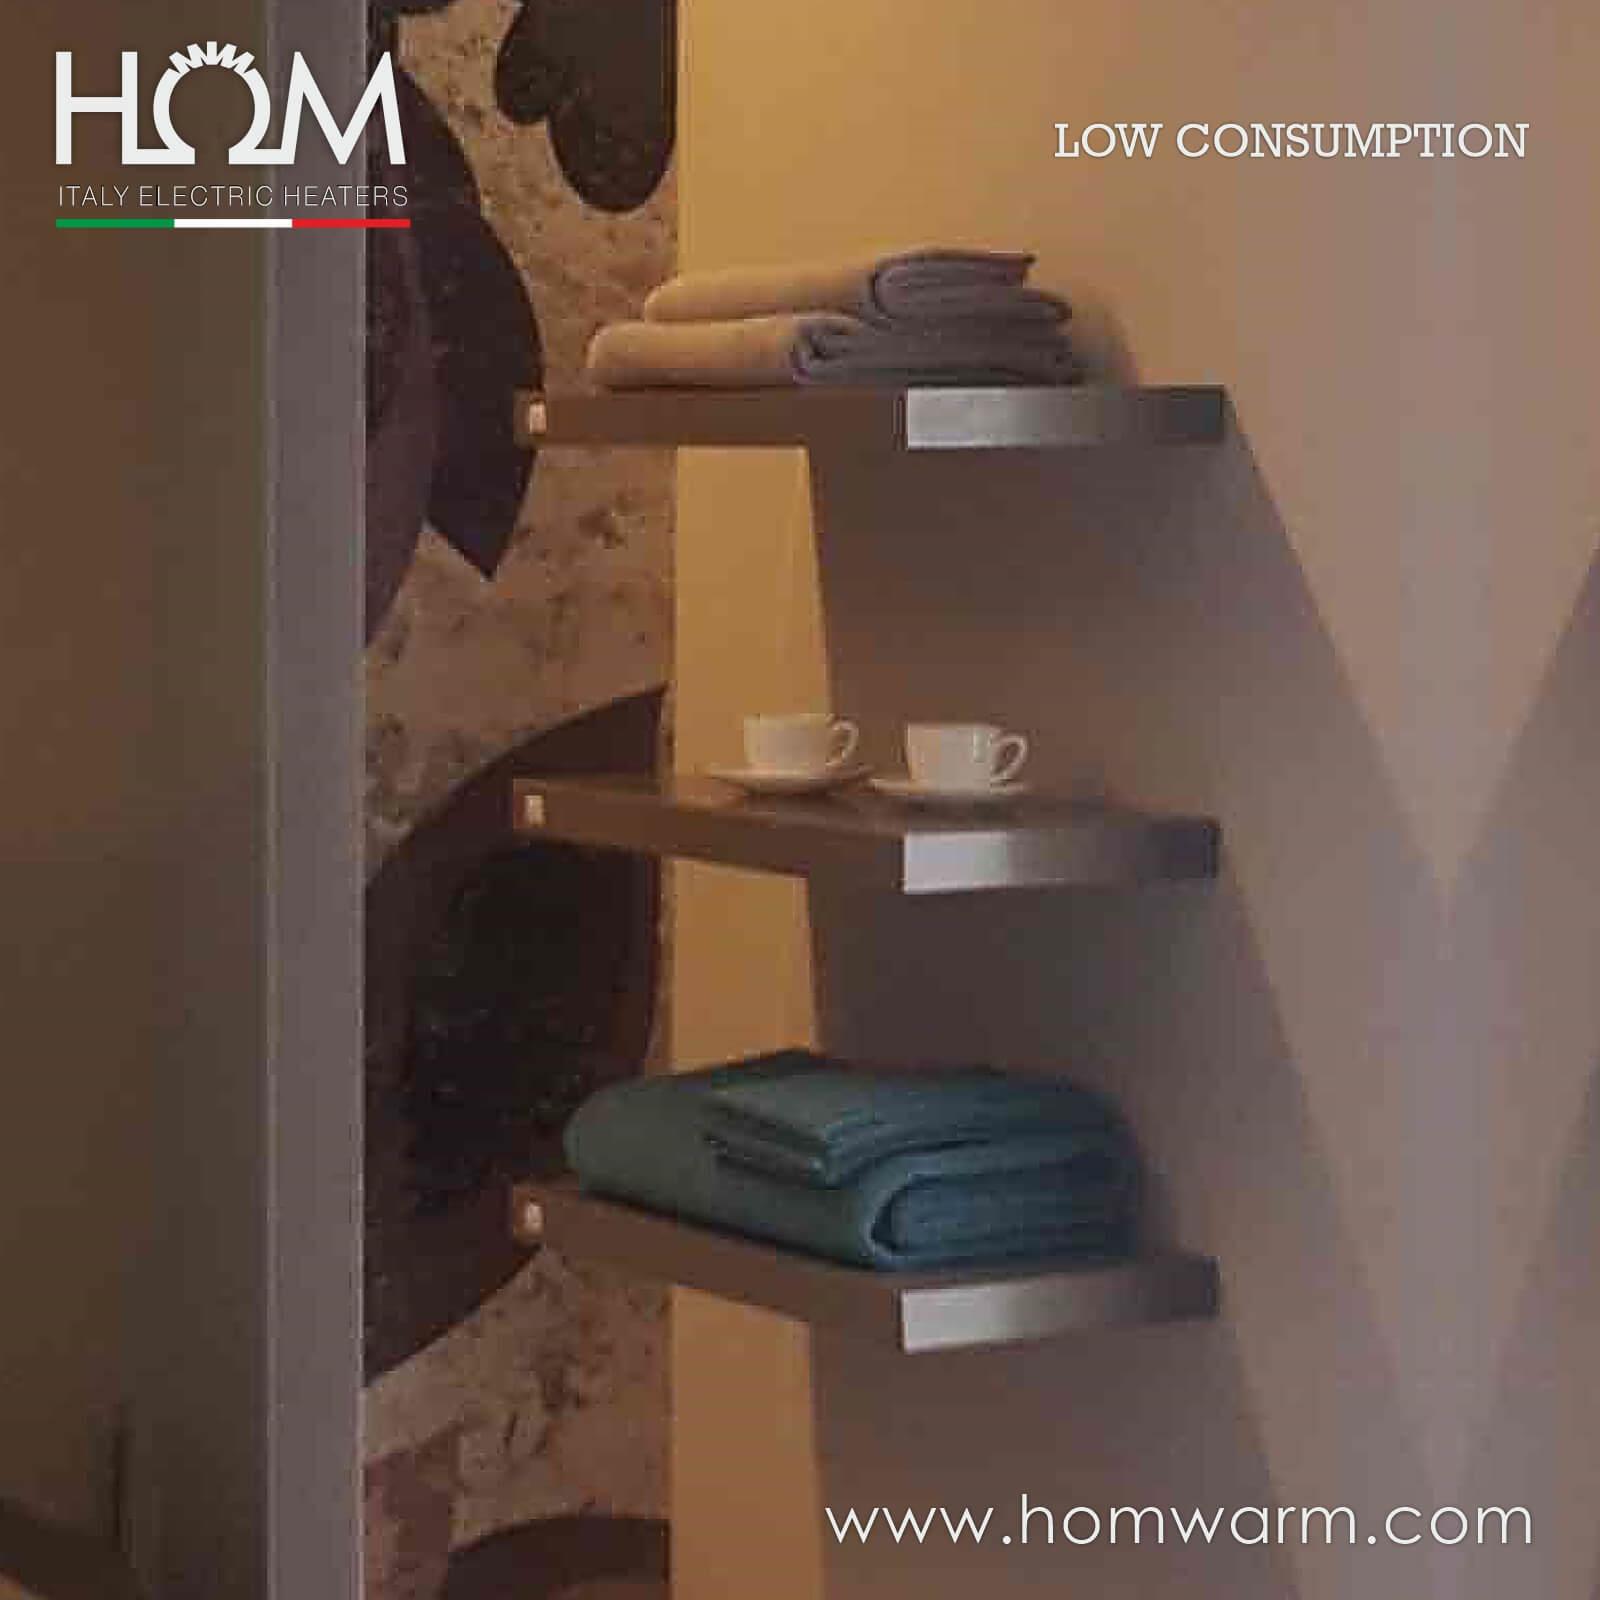 Centro estetico, Italy – Scalda salviette elettrici HOM mensola riscaldante